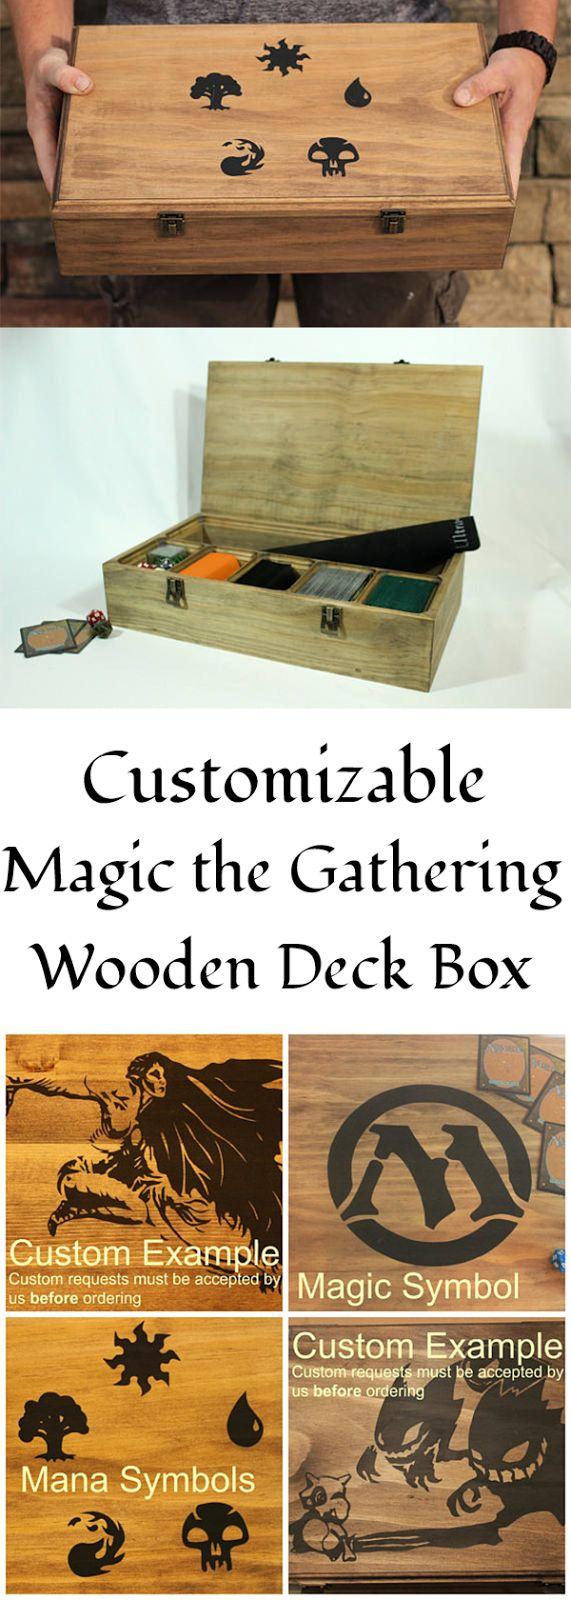 Magic the Gathering MTG Deck Box, Trading Card Organizer, Card Box, Custom Options Available #ad